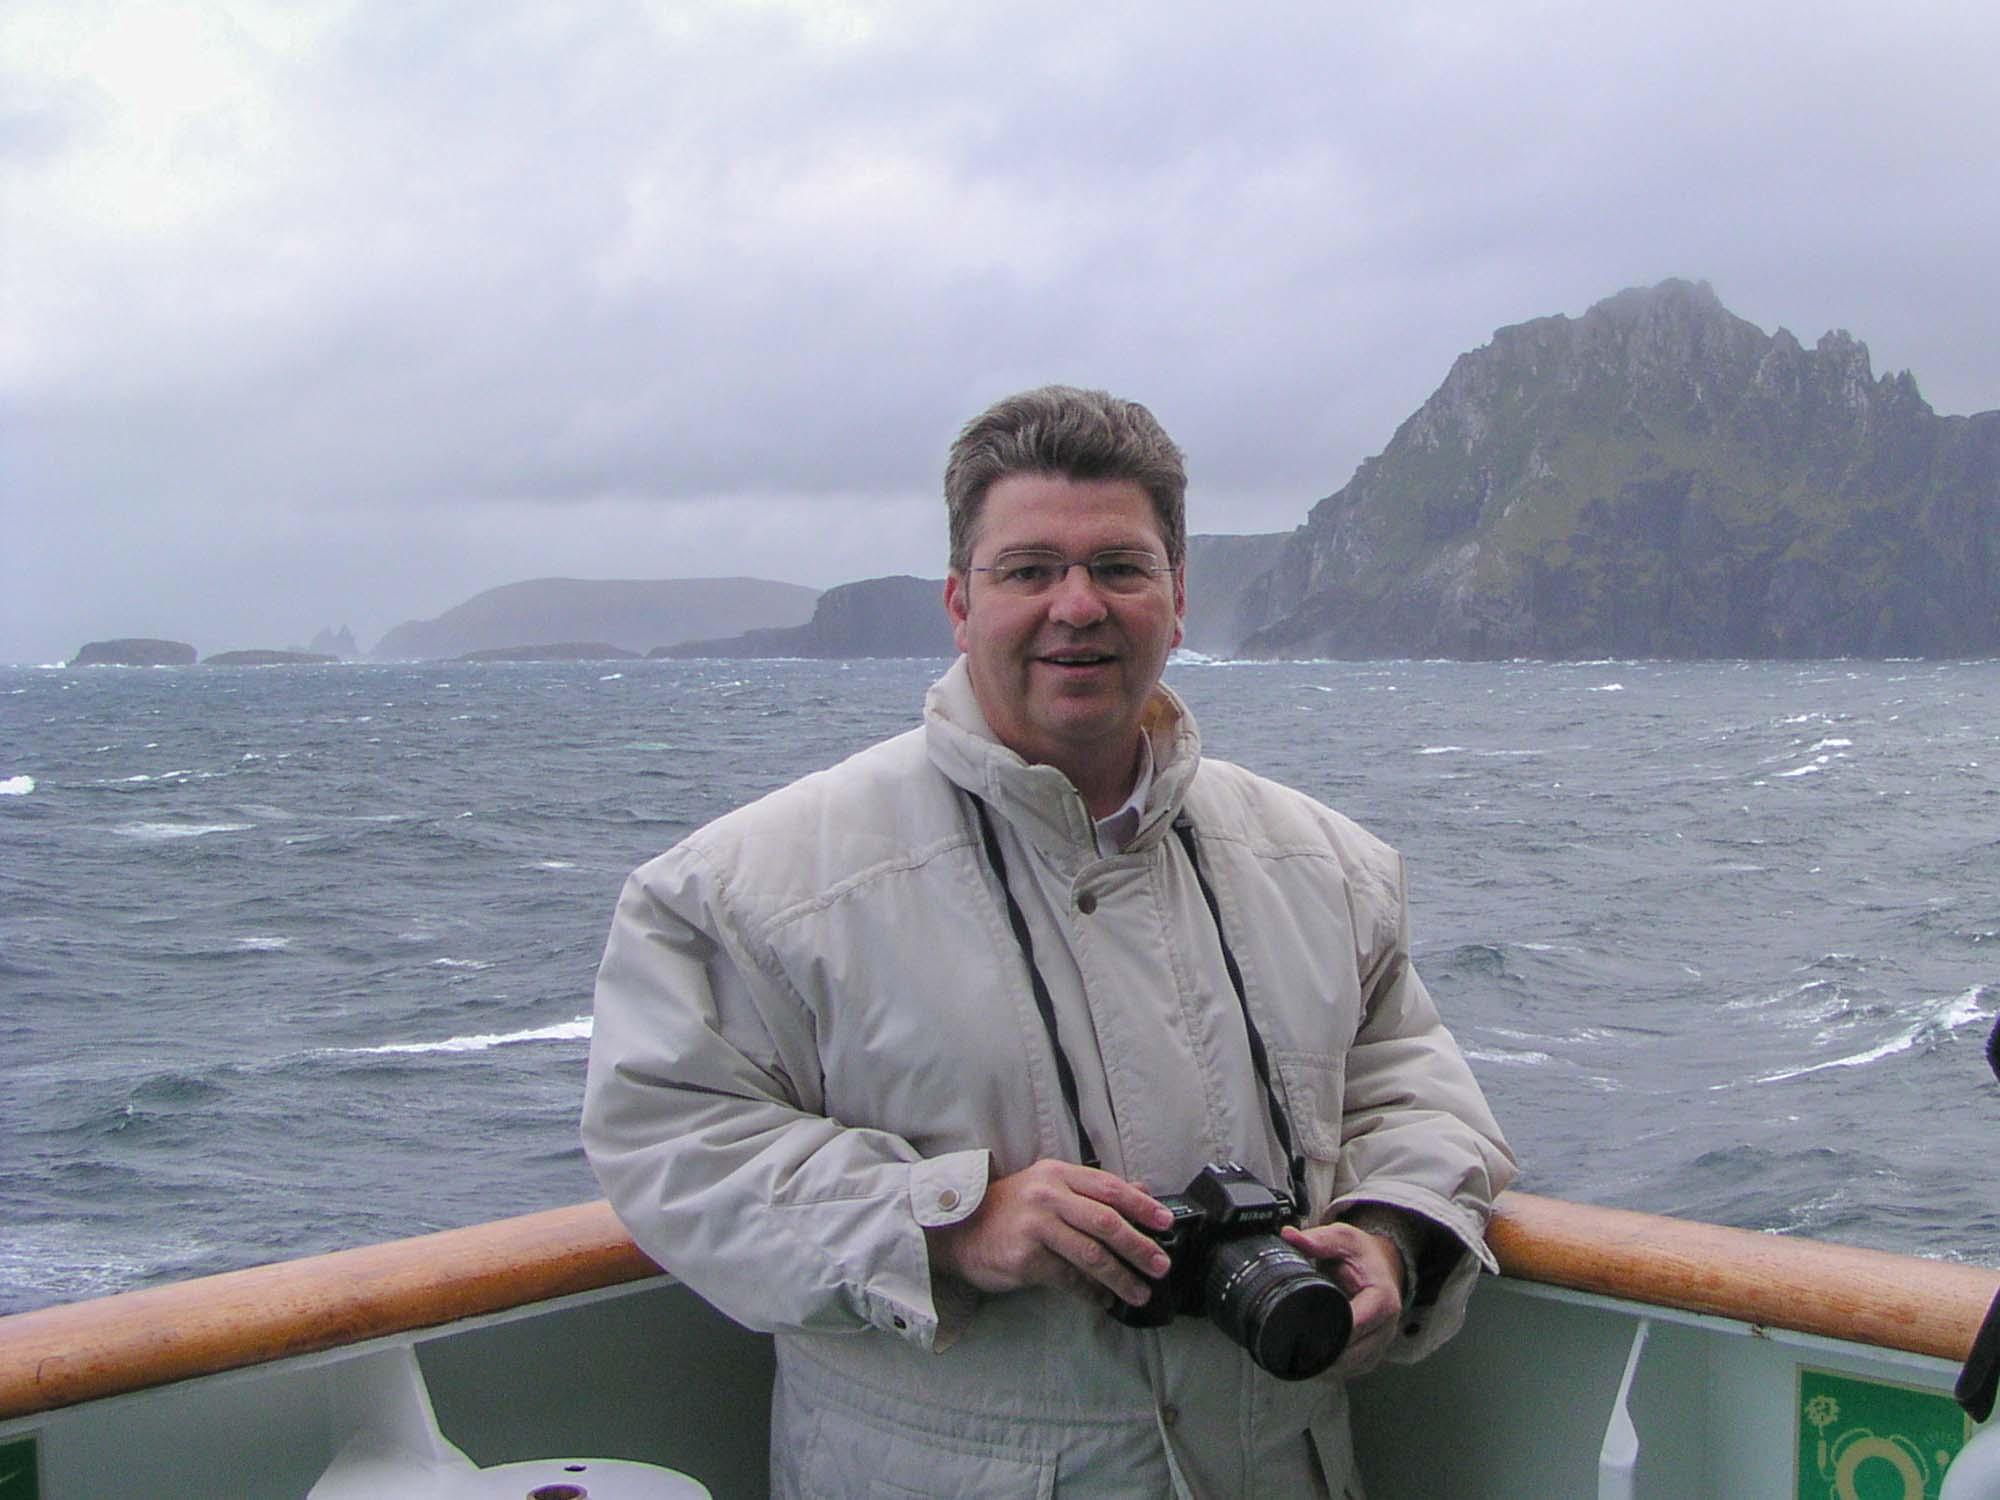 Peter Jurgilewitsch vor Kap Hoorn, Chile